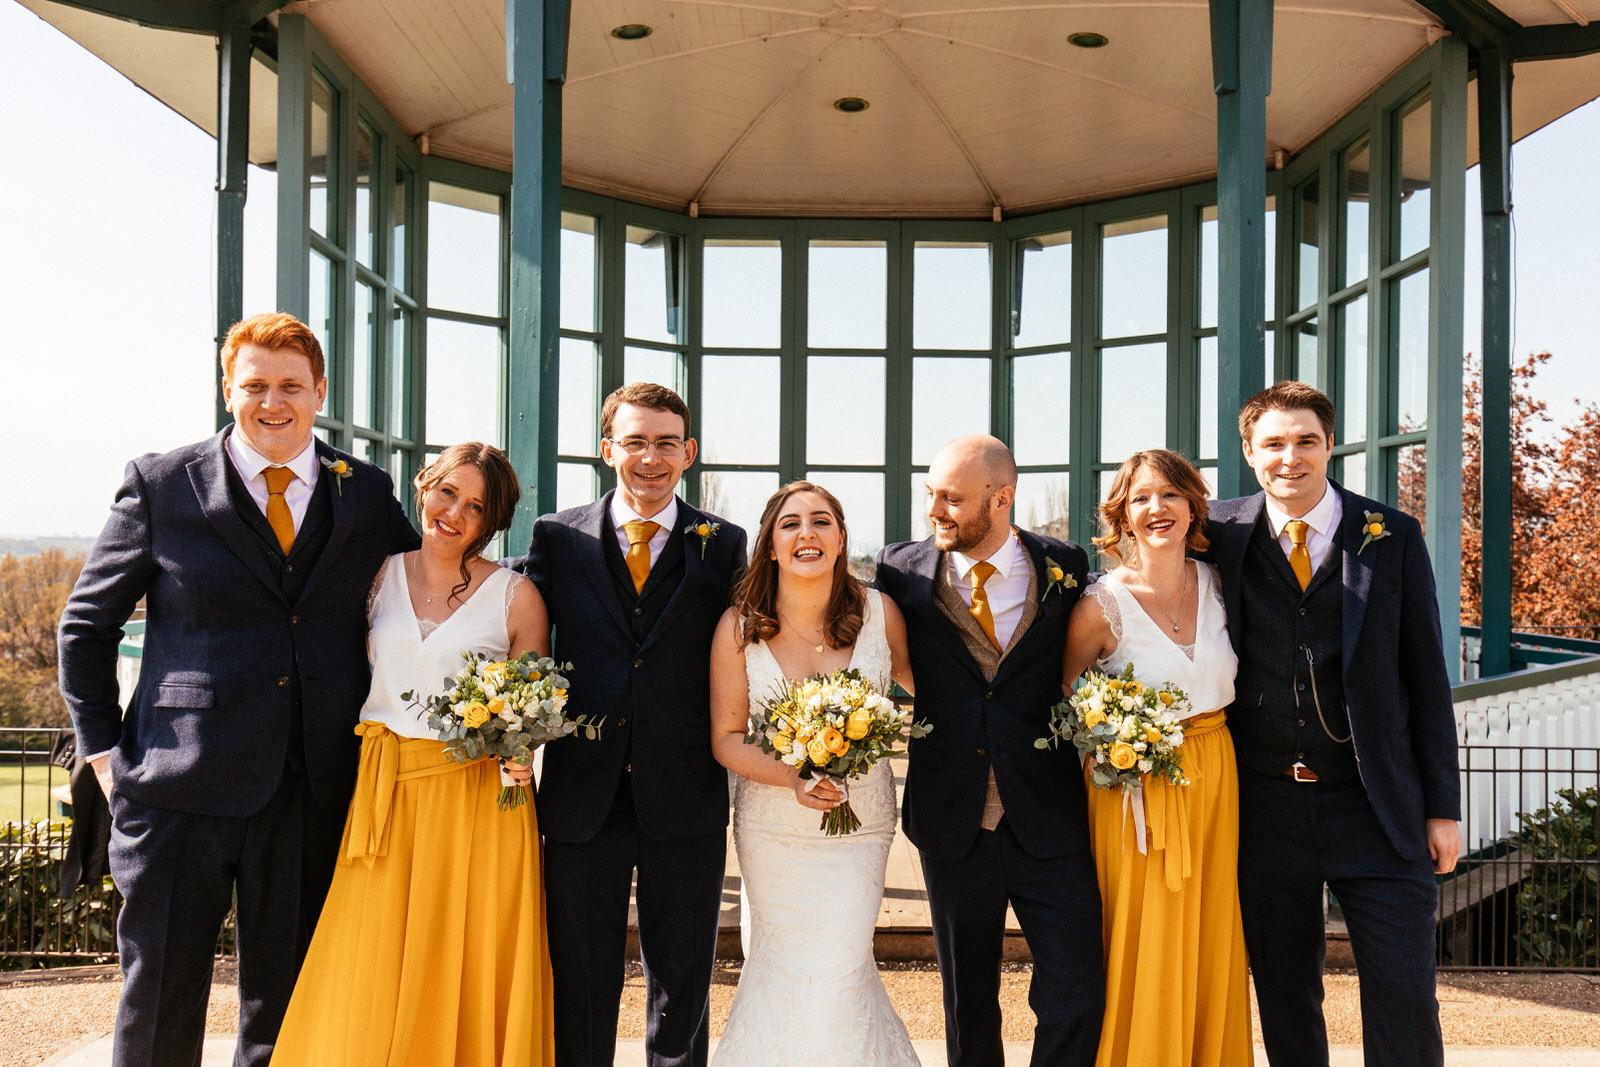 Jenni-and-James-Wedding-Highlights-27.jpg